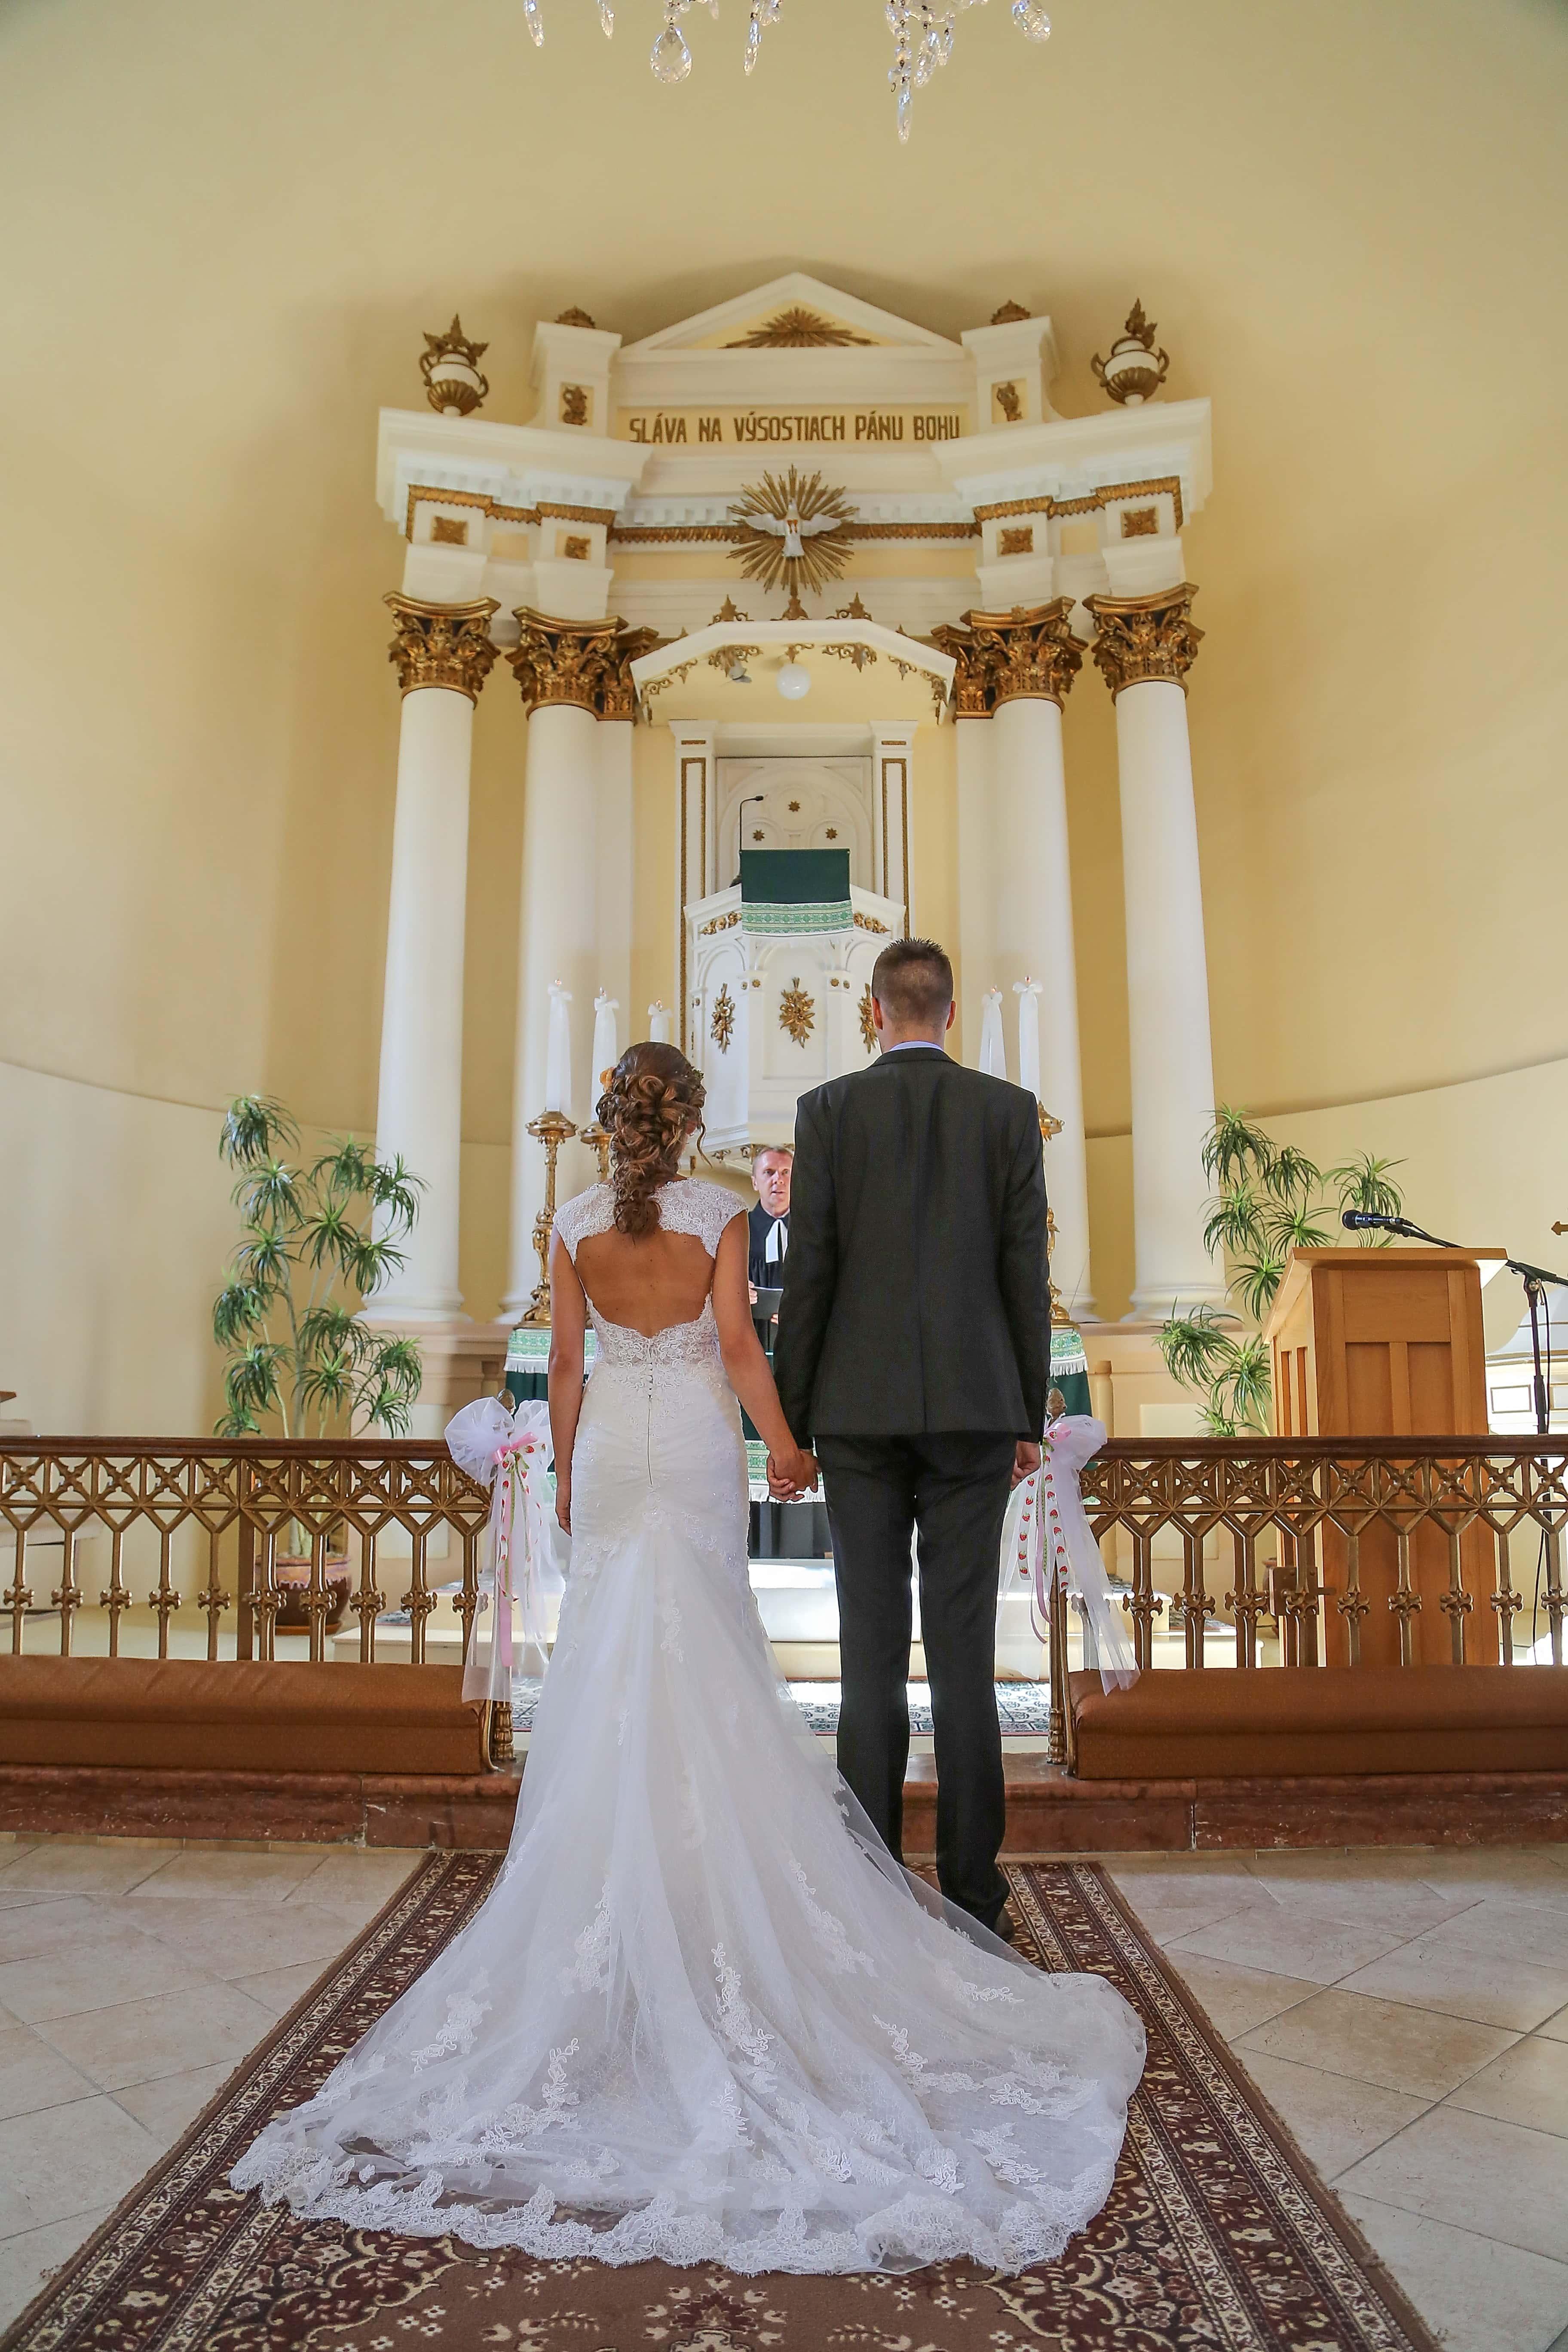 katolikus menyasszony ingyen)